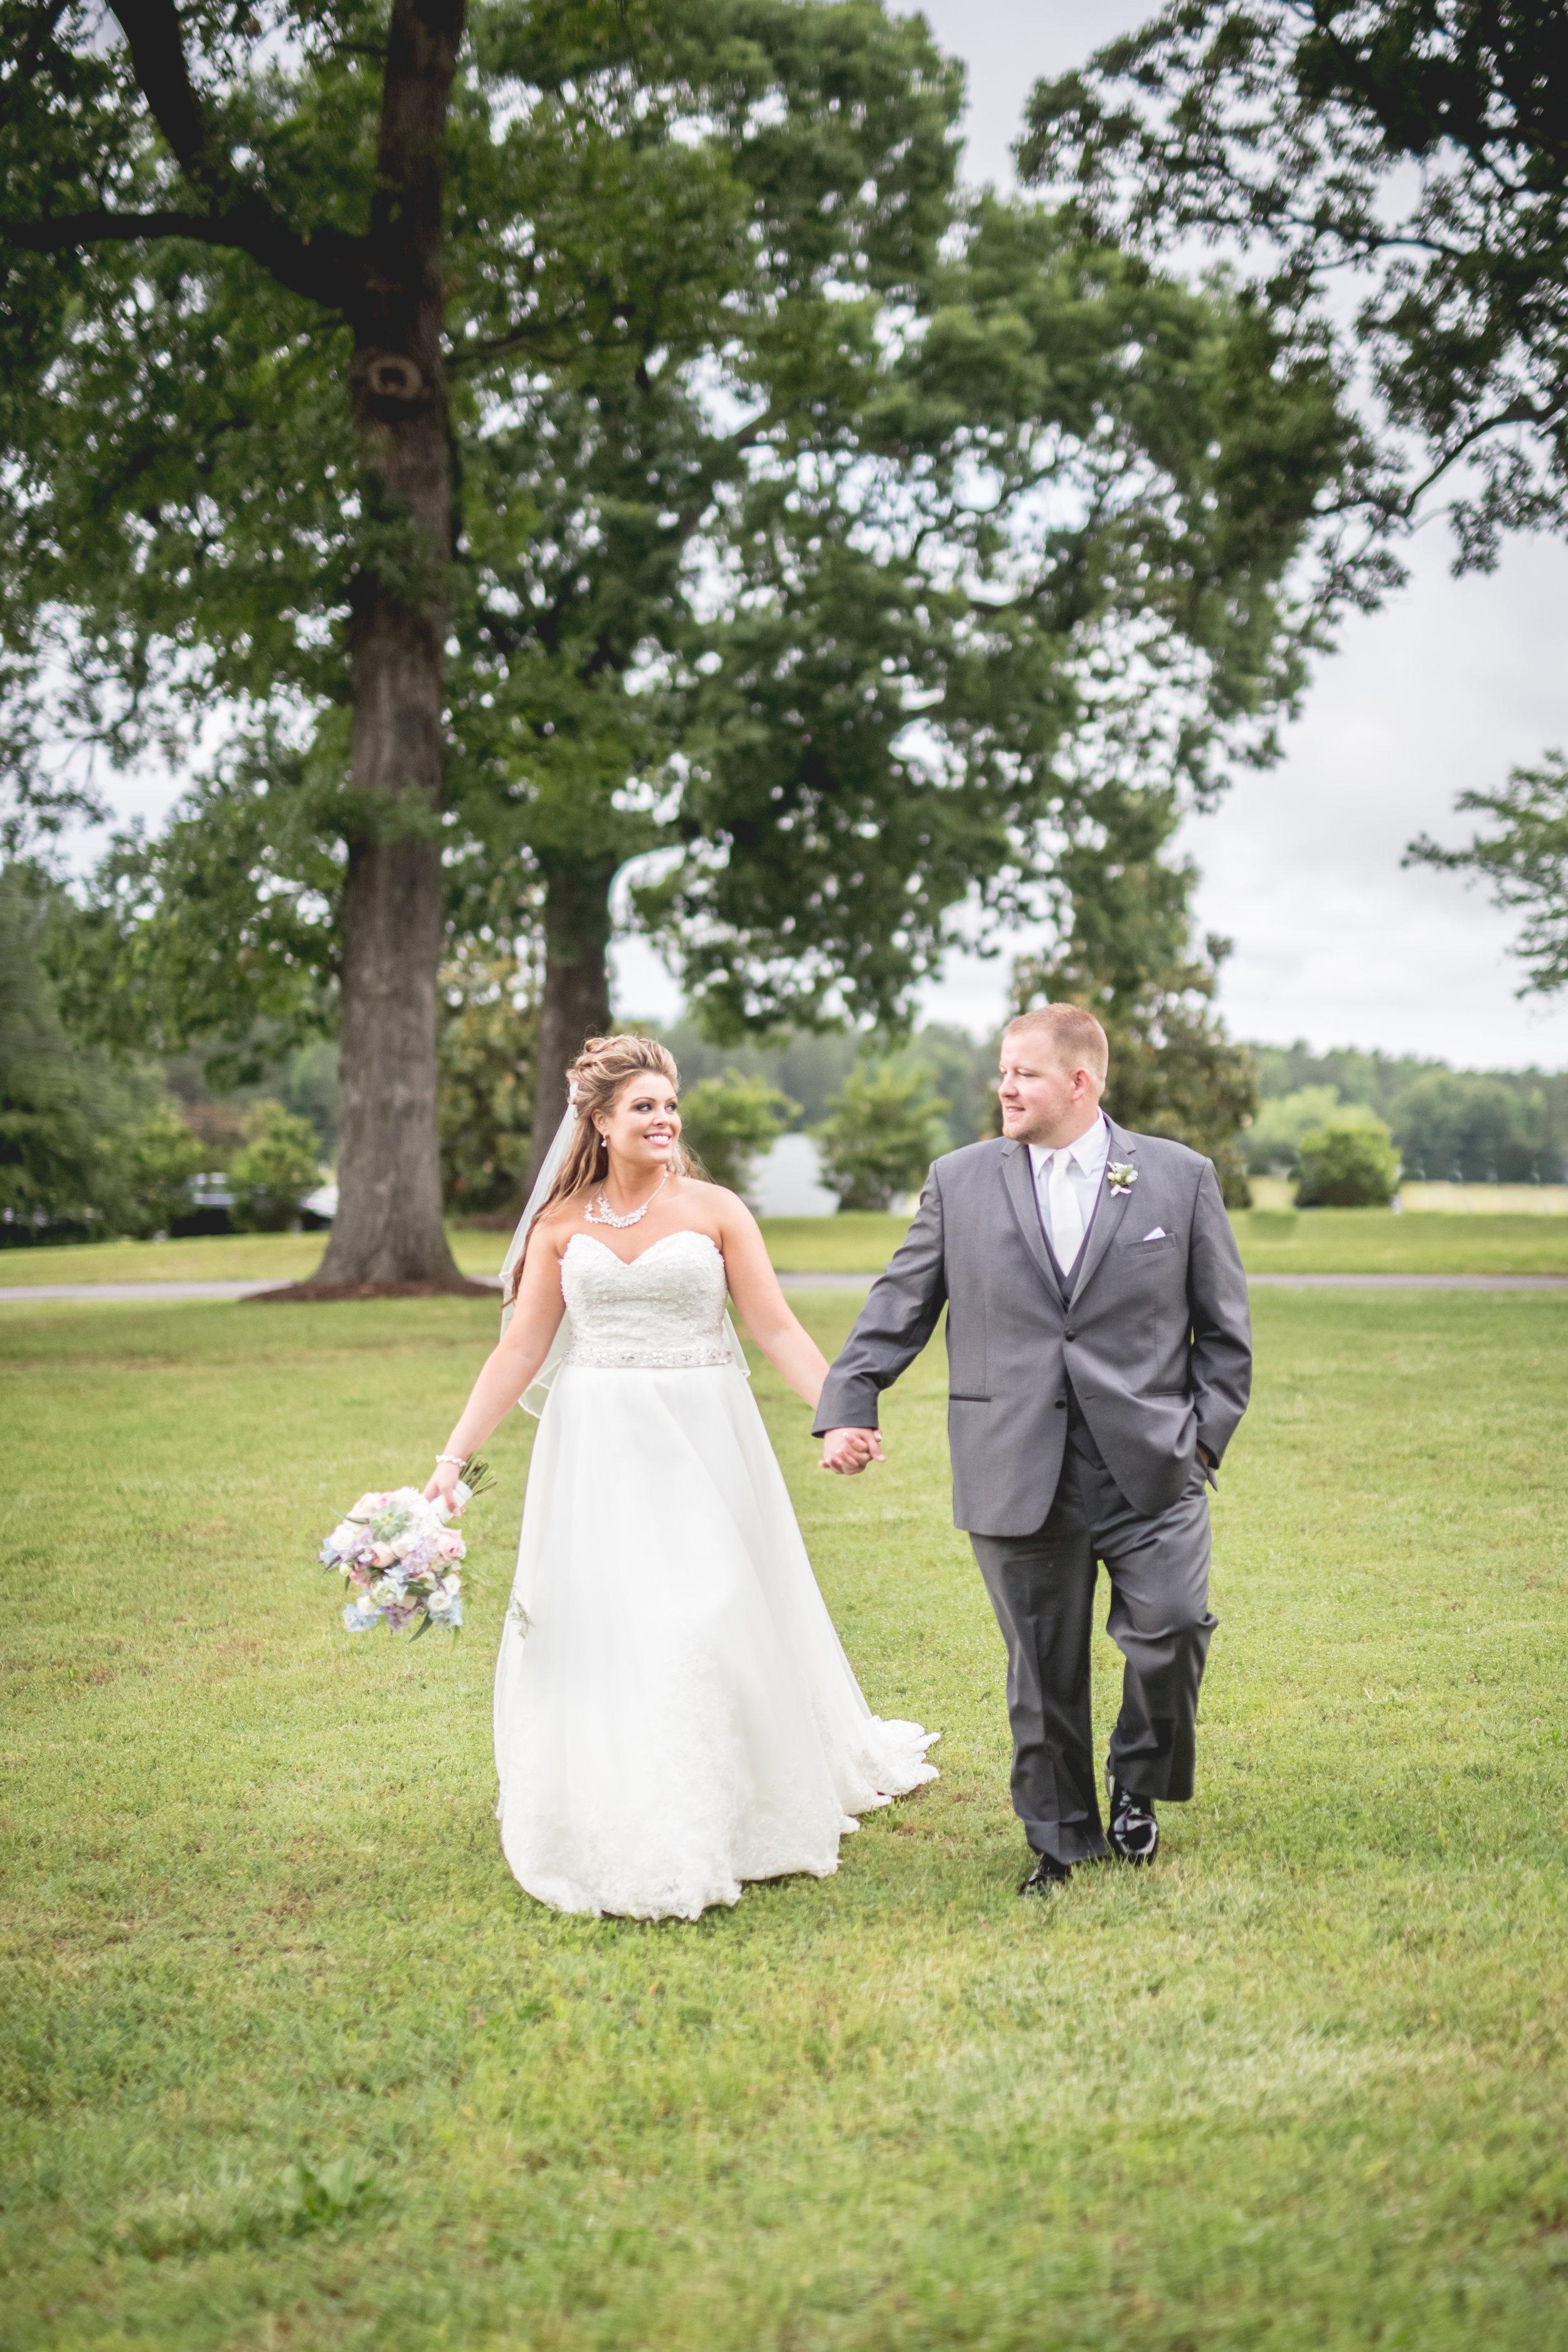 Morton-Price Wedding-497.jpg